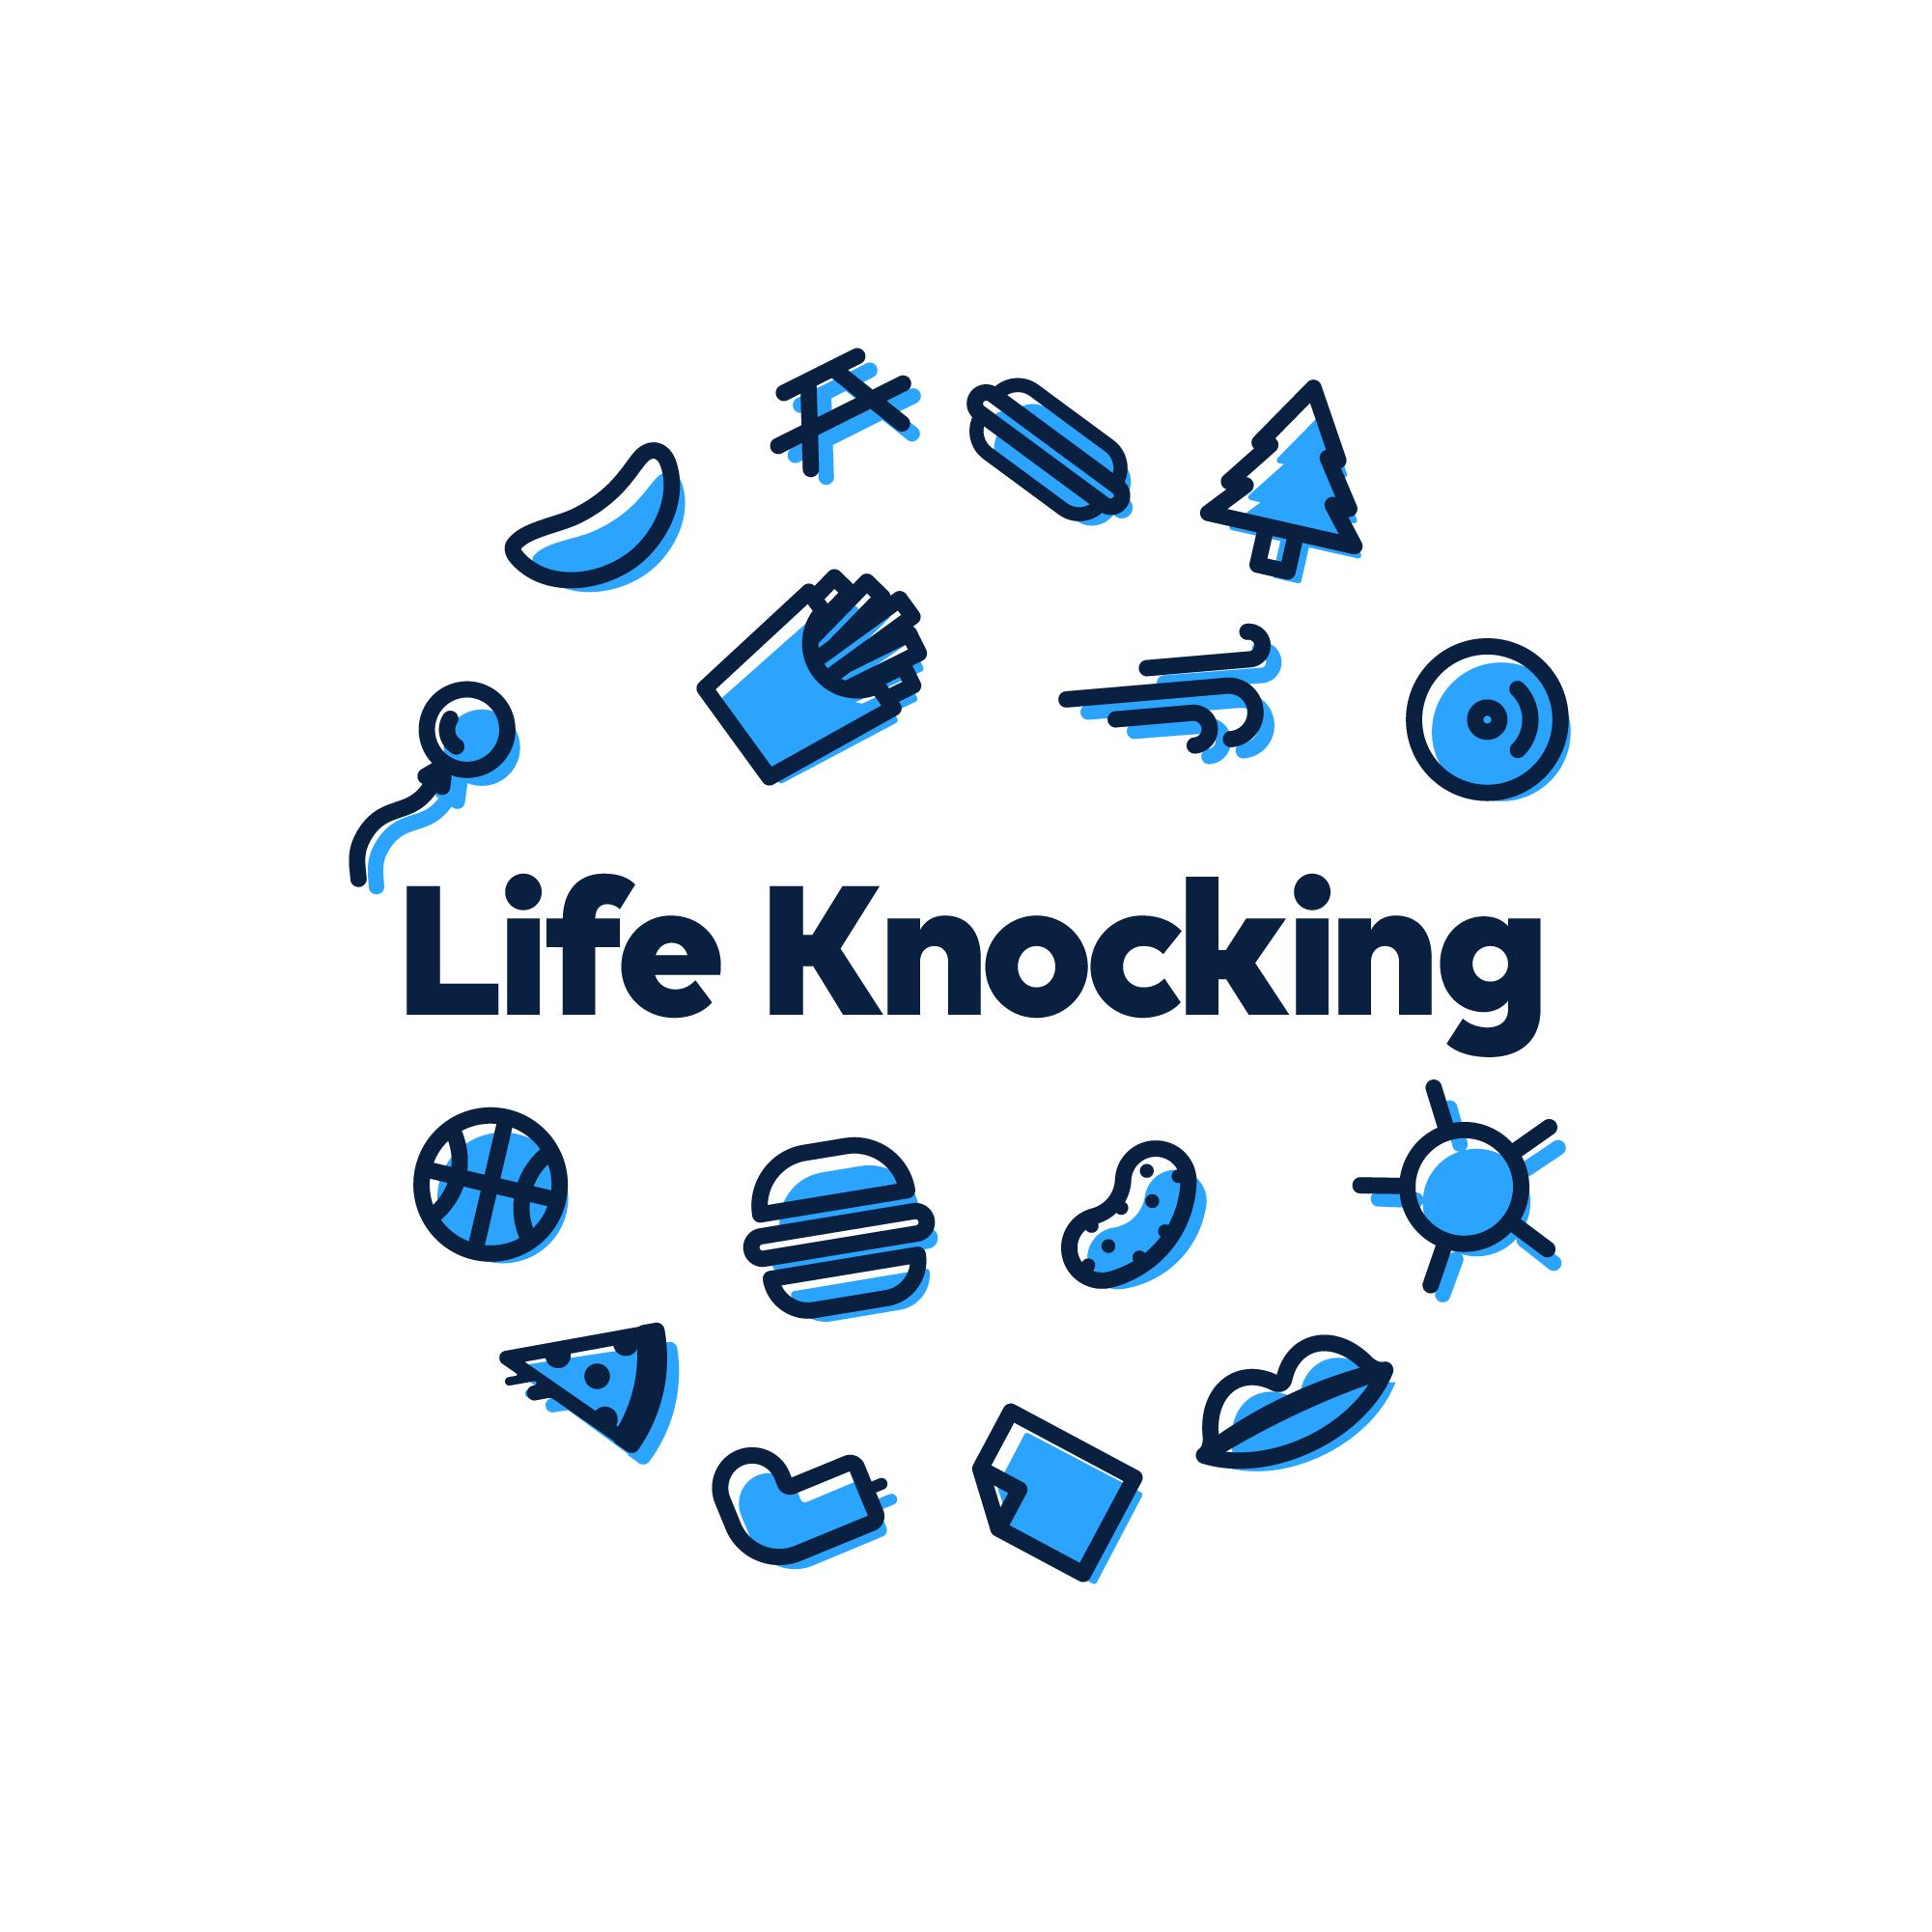 Life Knocking